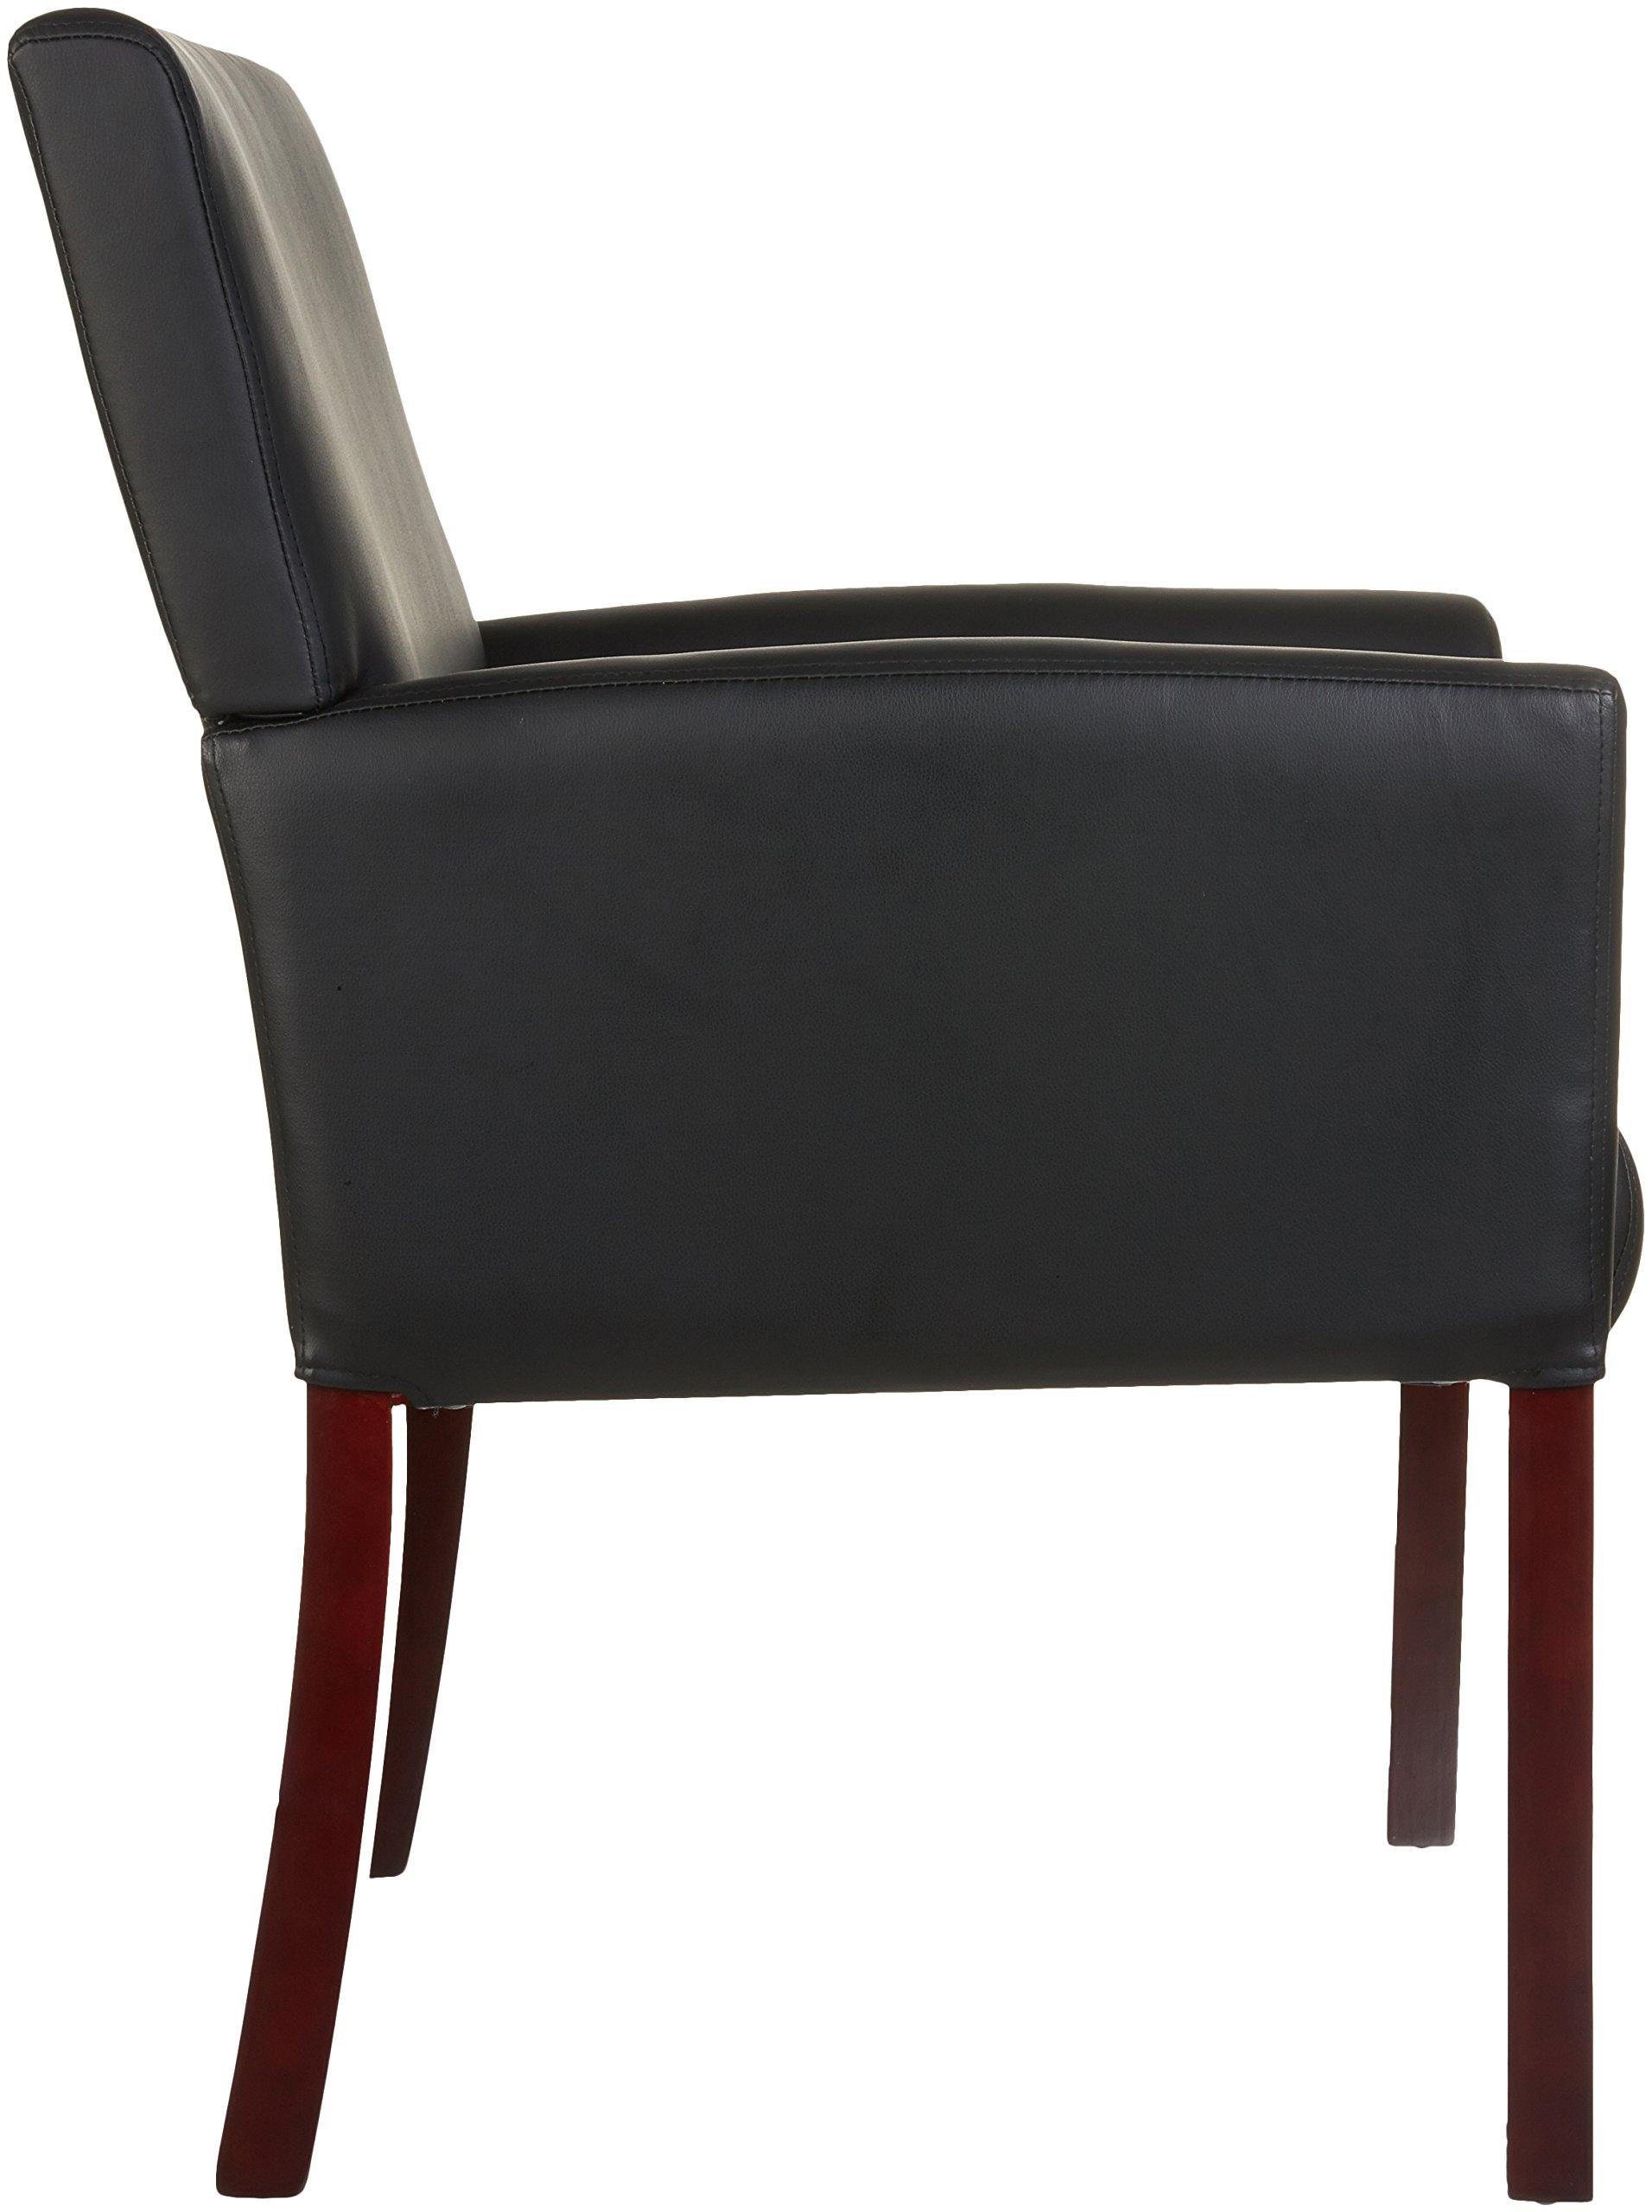 AmazonBasics Reception Chair, Black by AmazonBasics (Image #5)